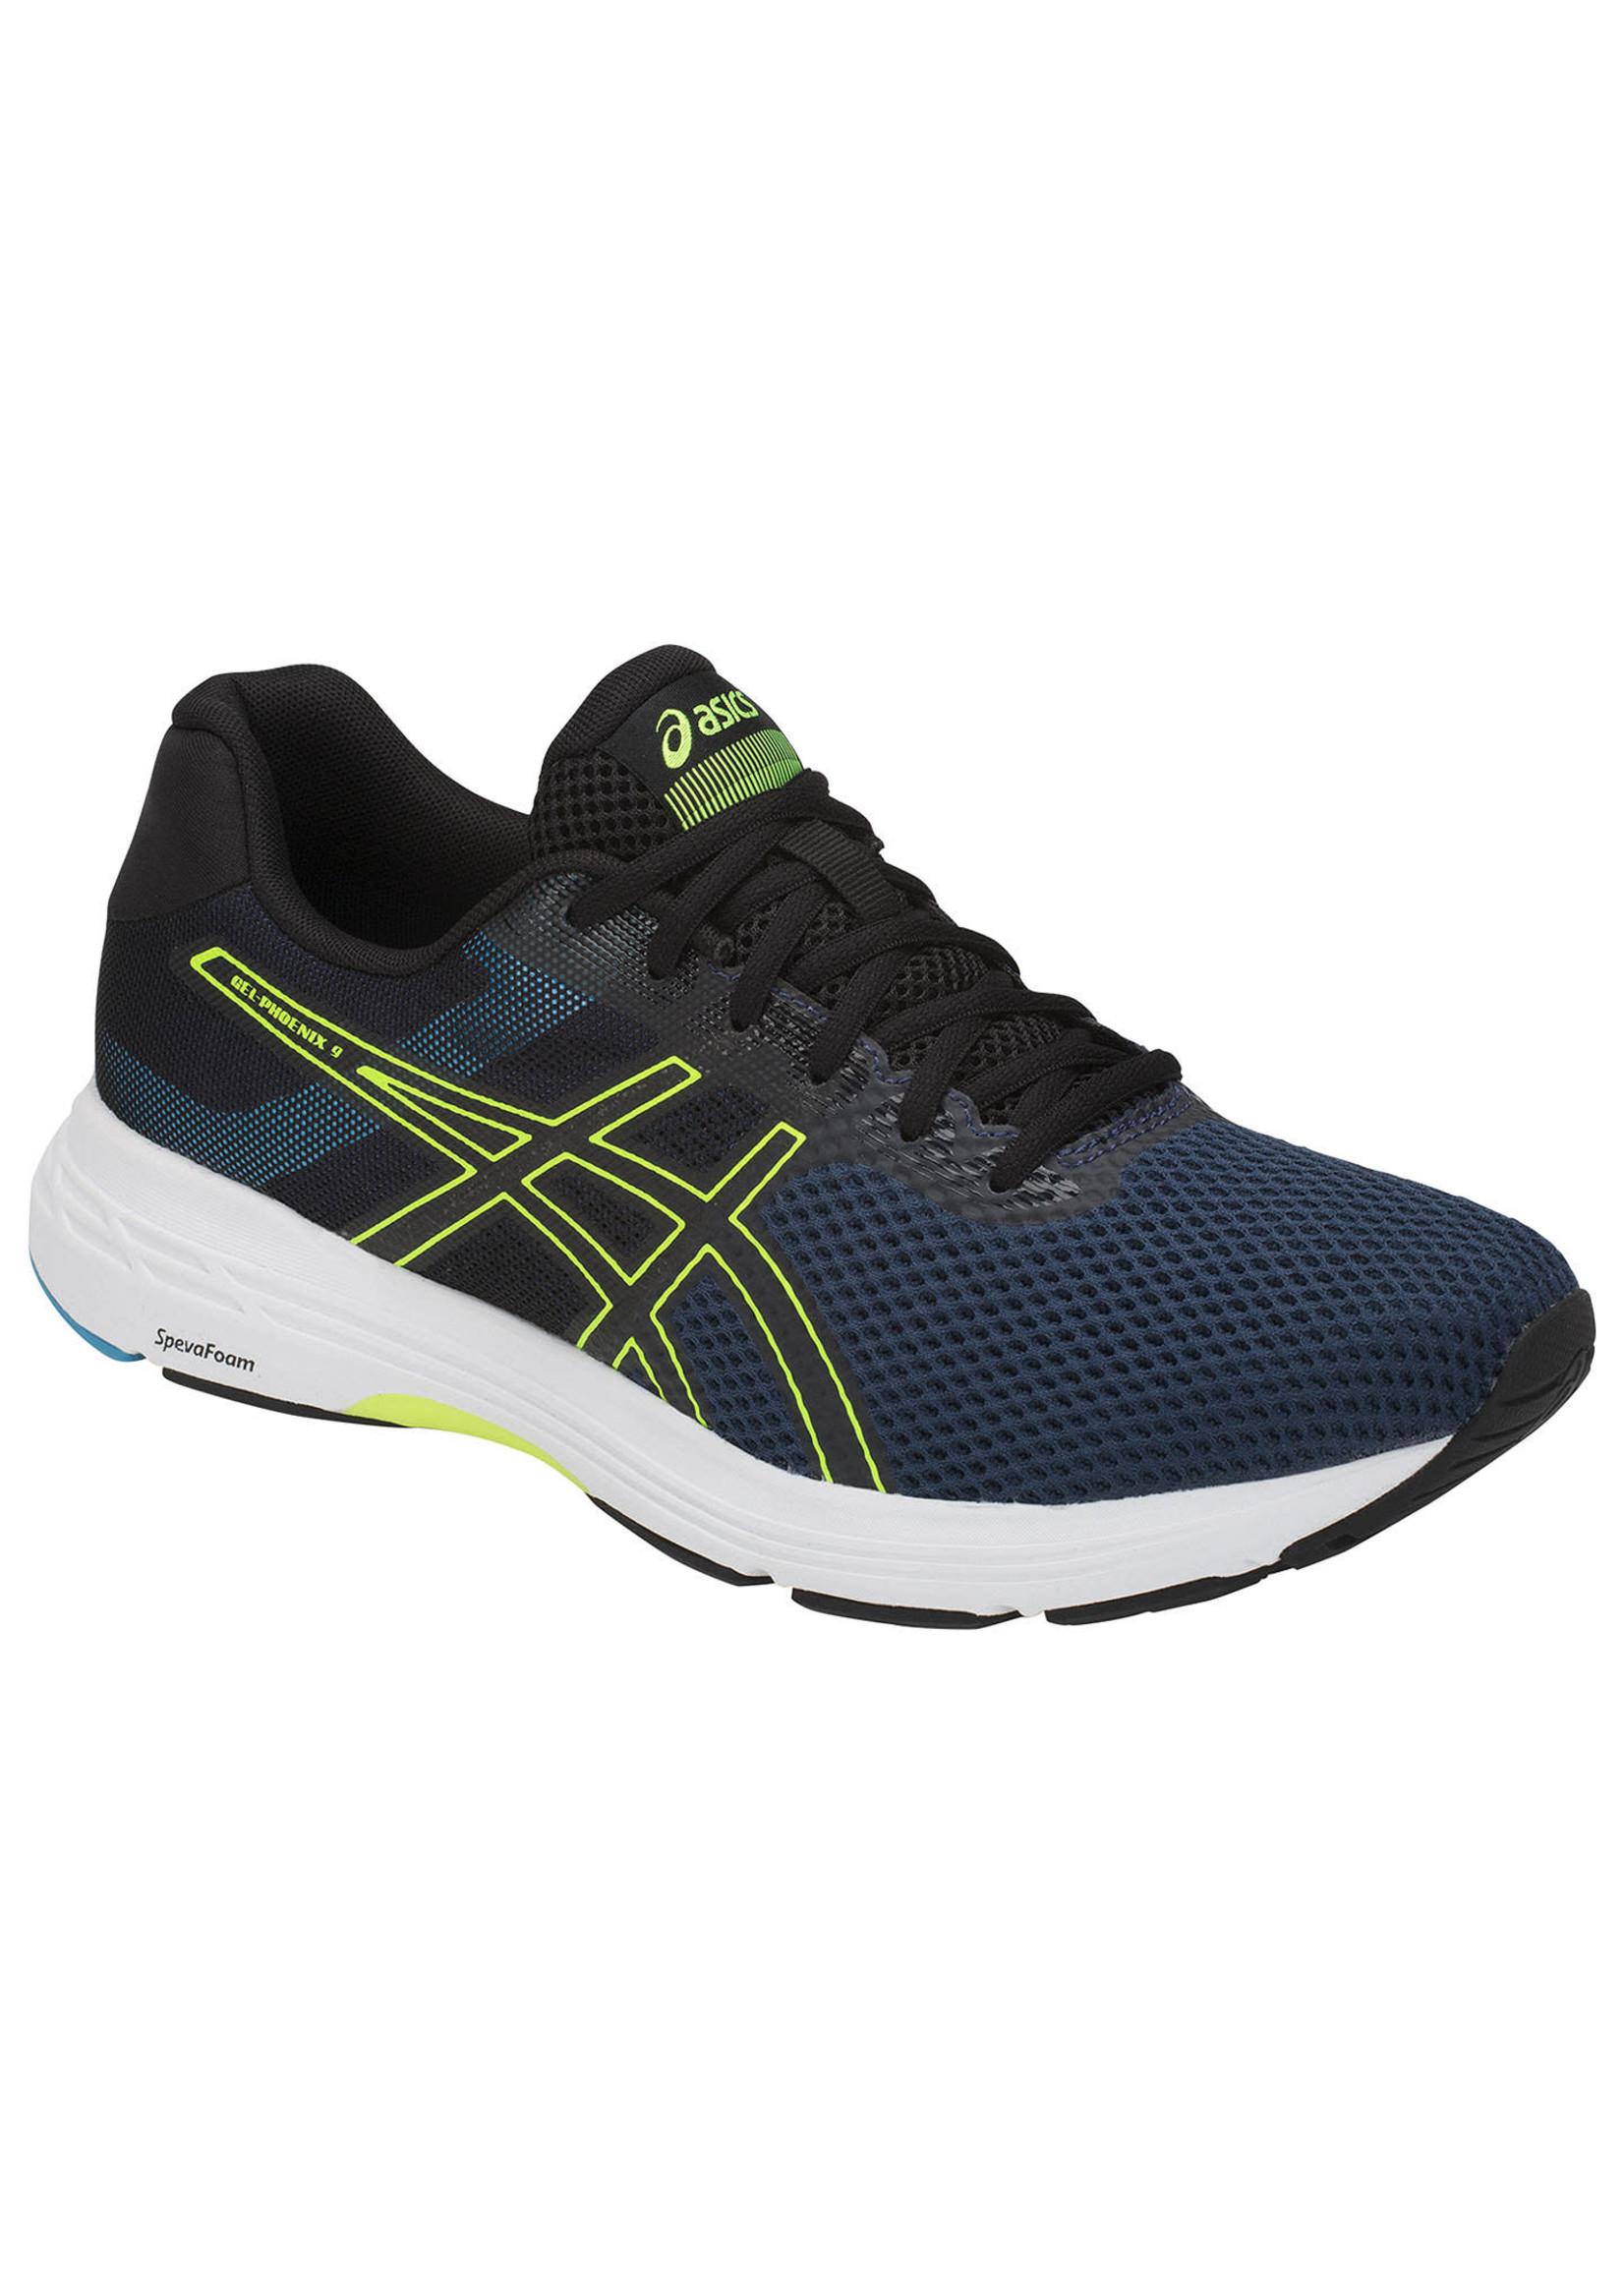 Asics Asics Gel Phoenix 9 Mens Running Shoe